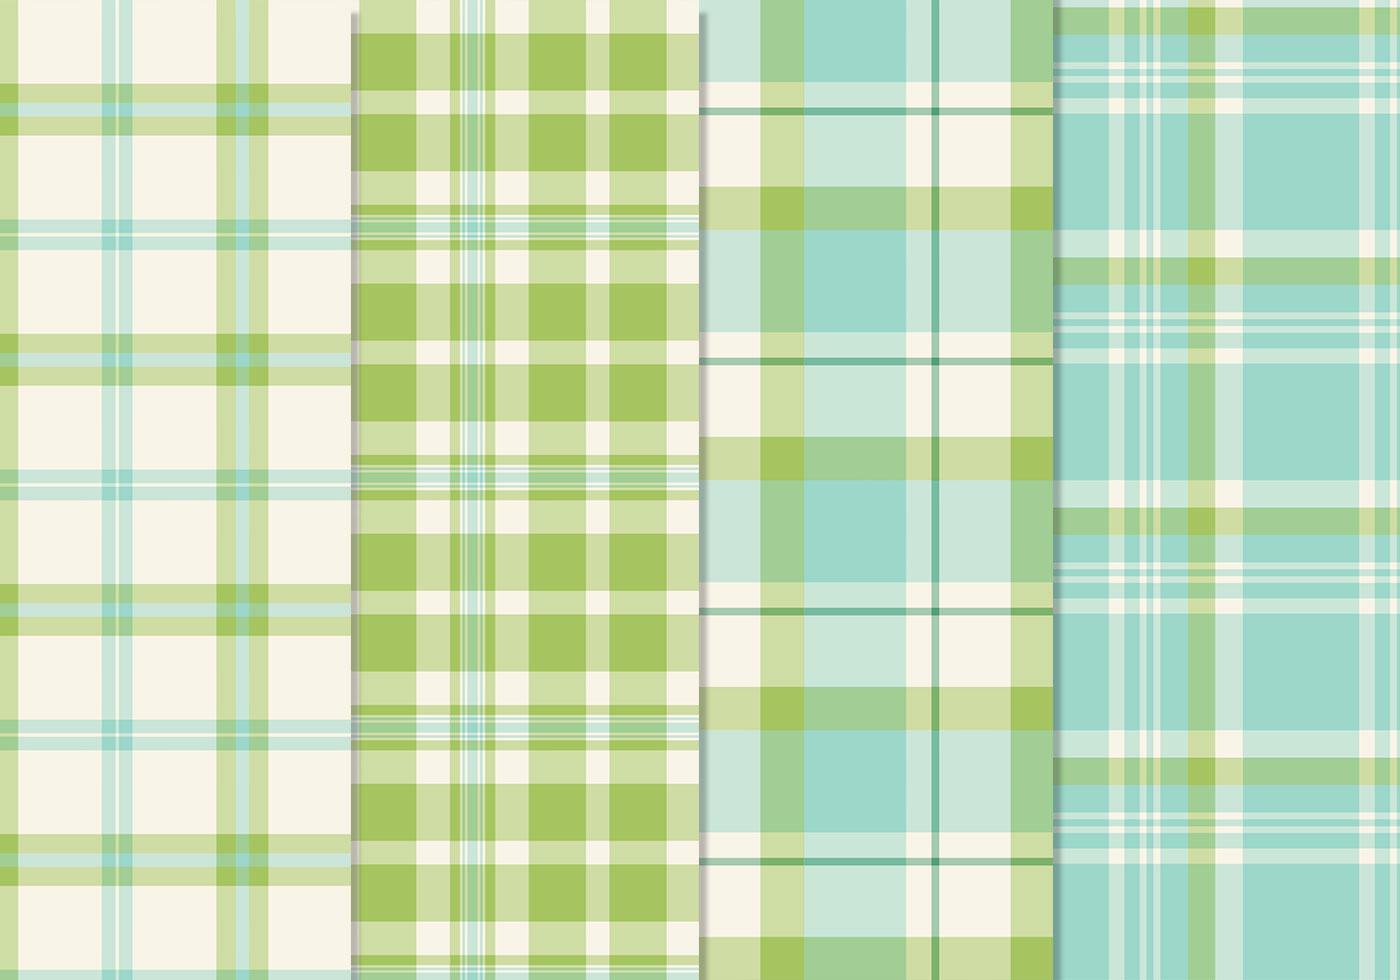 Fresh Blue Green Seamless Plaid Patterns PSD - Free ...